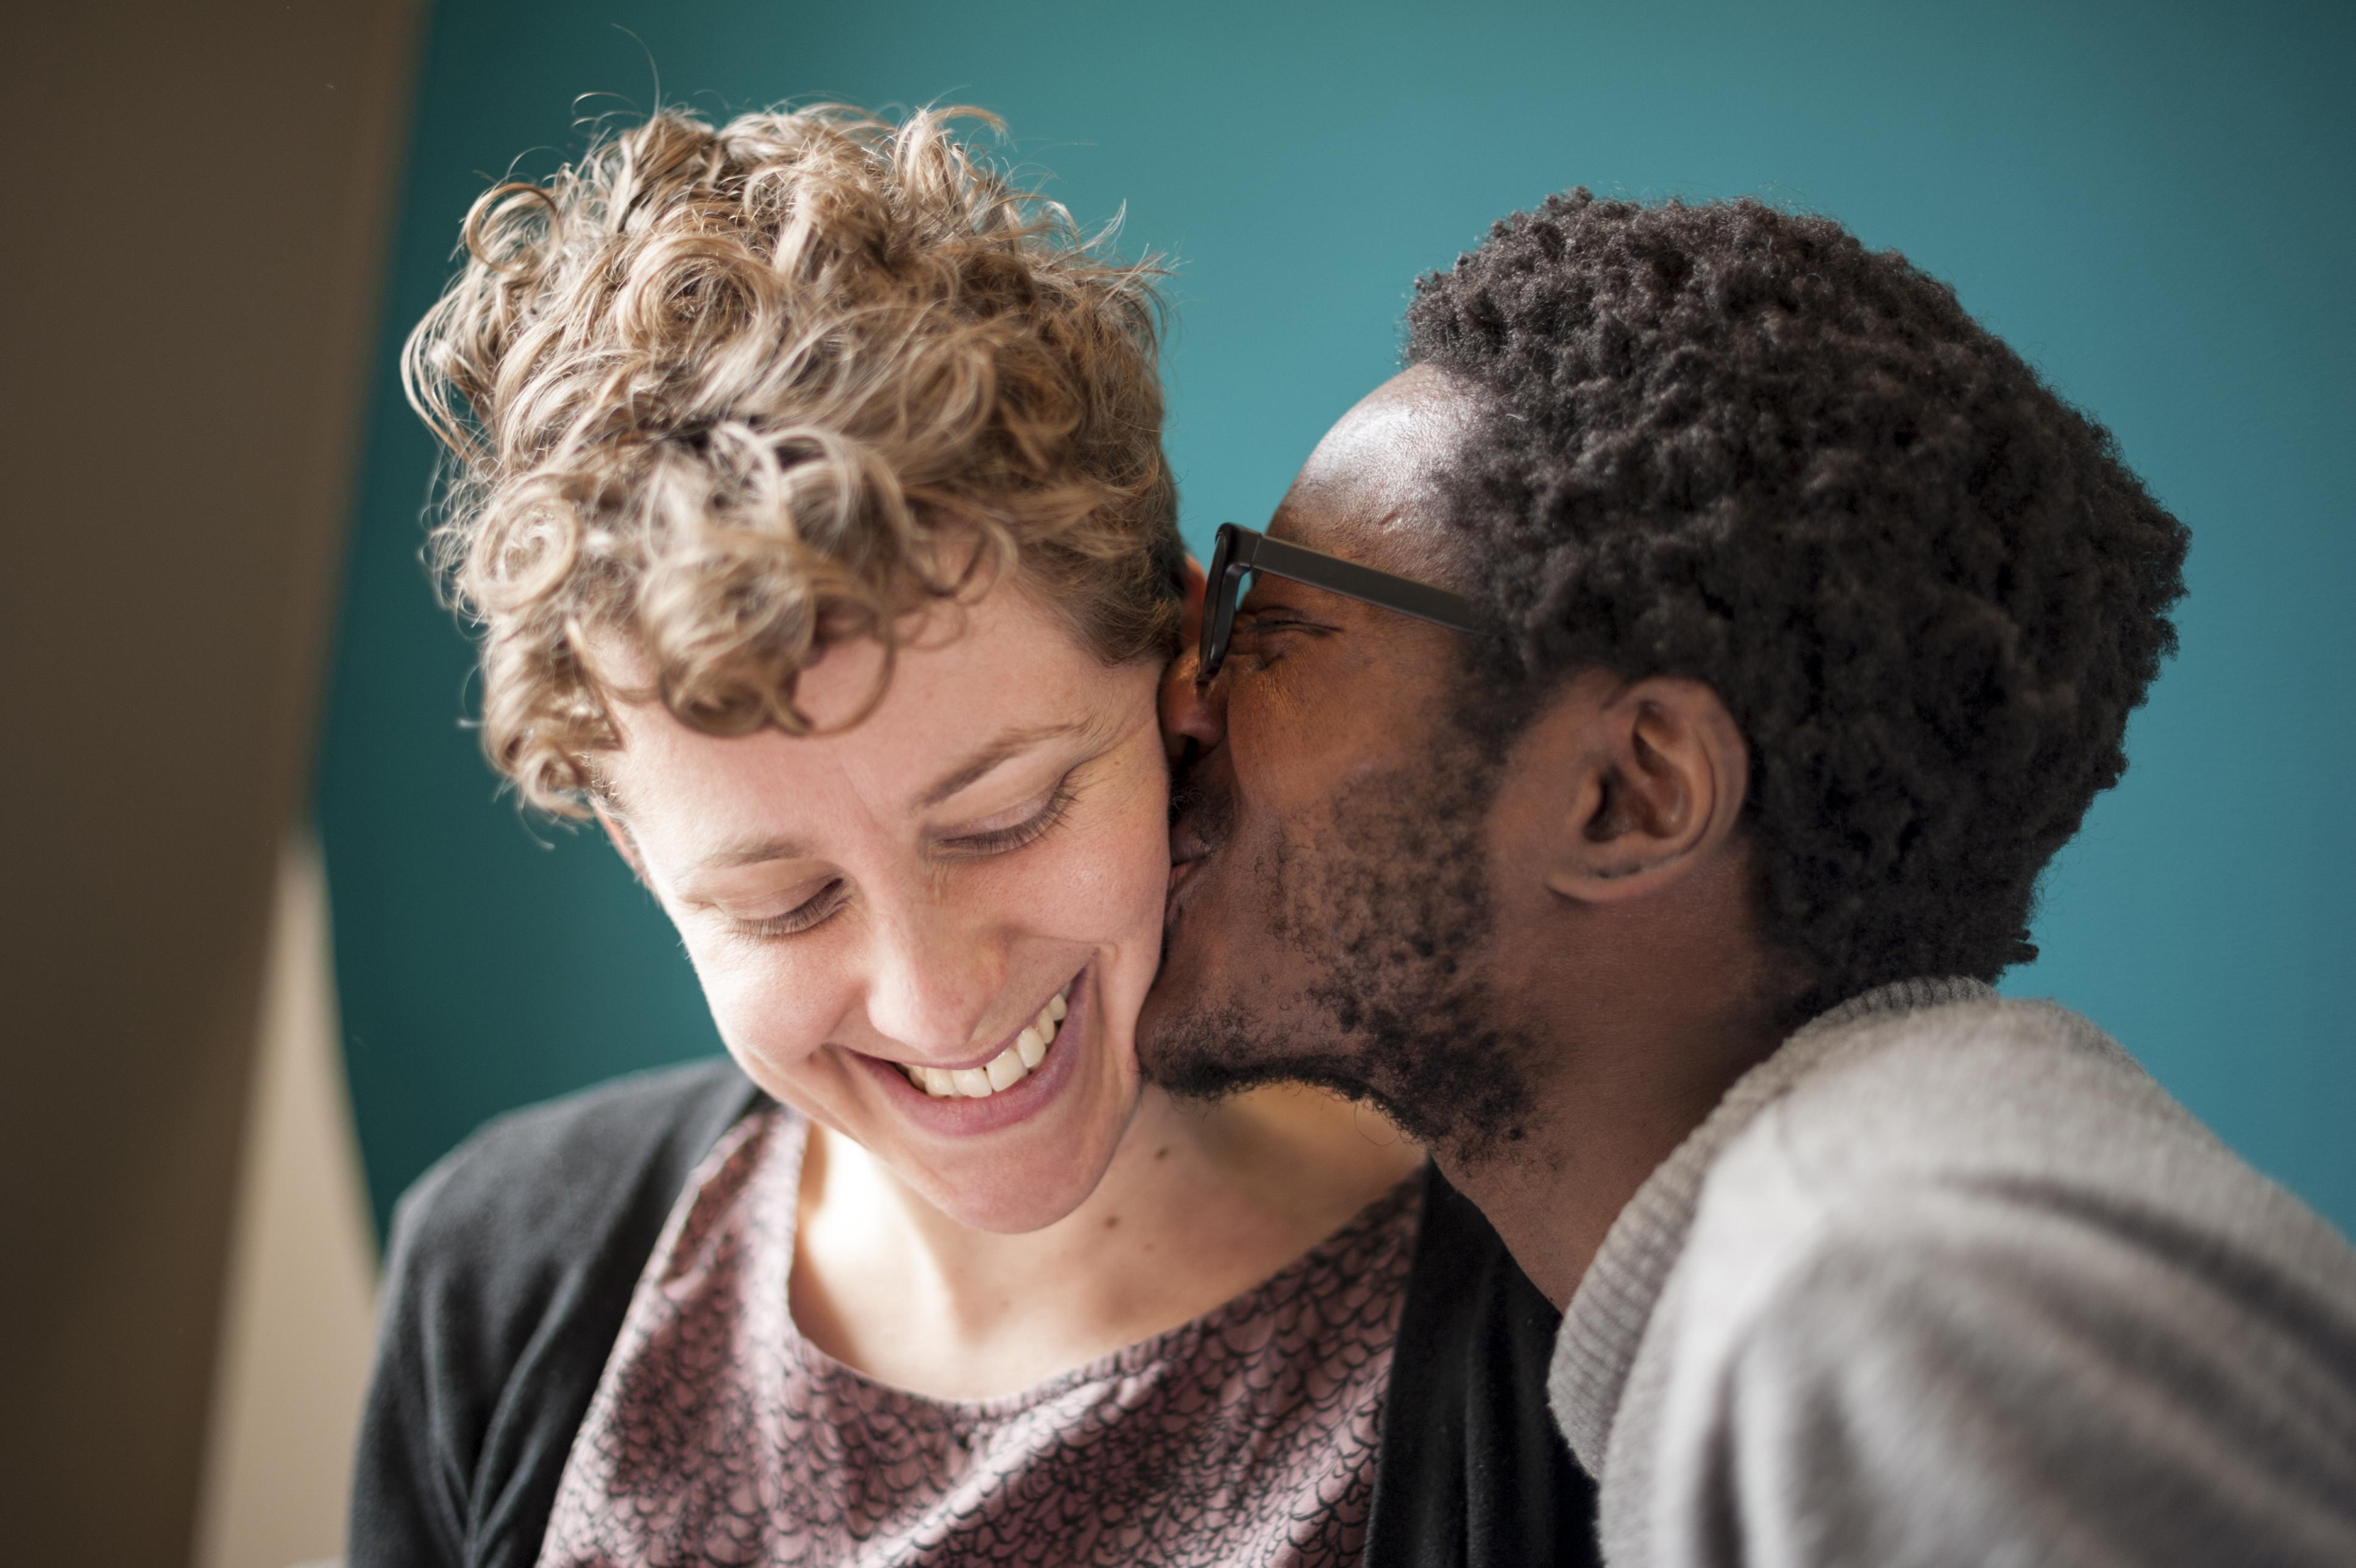 Man kissing his girlfriend